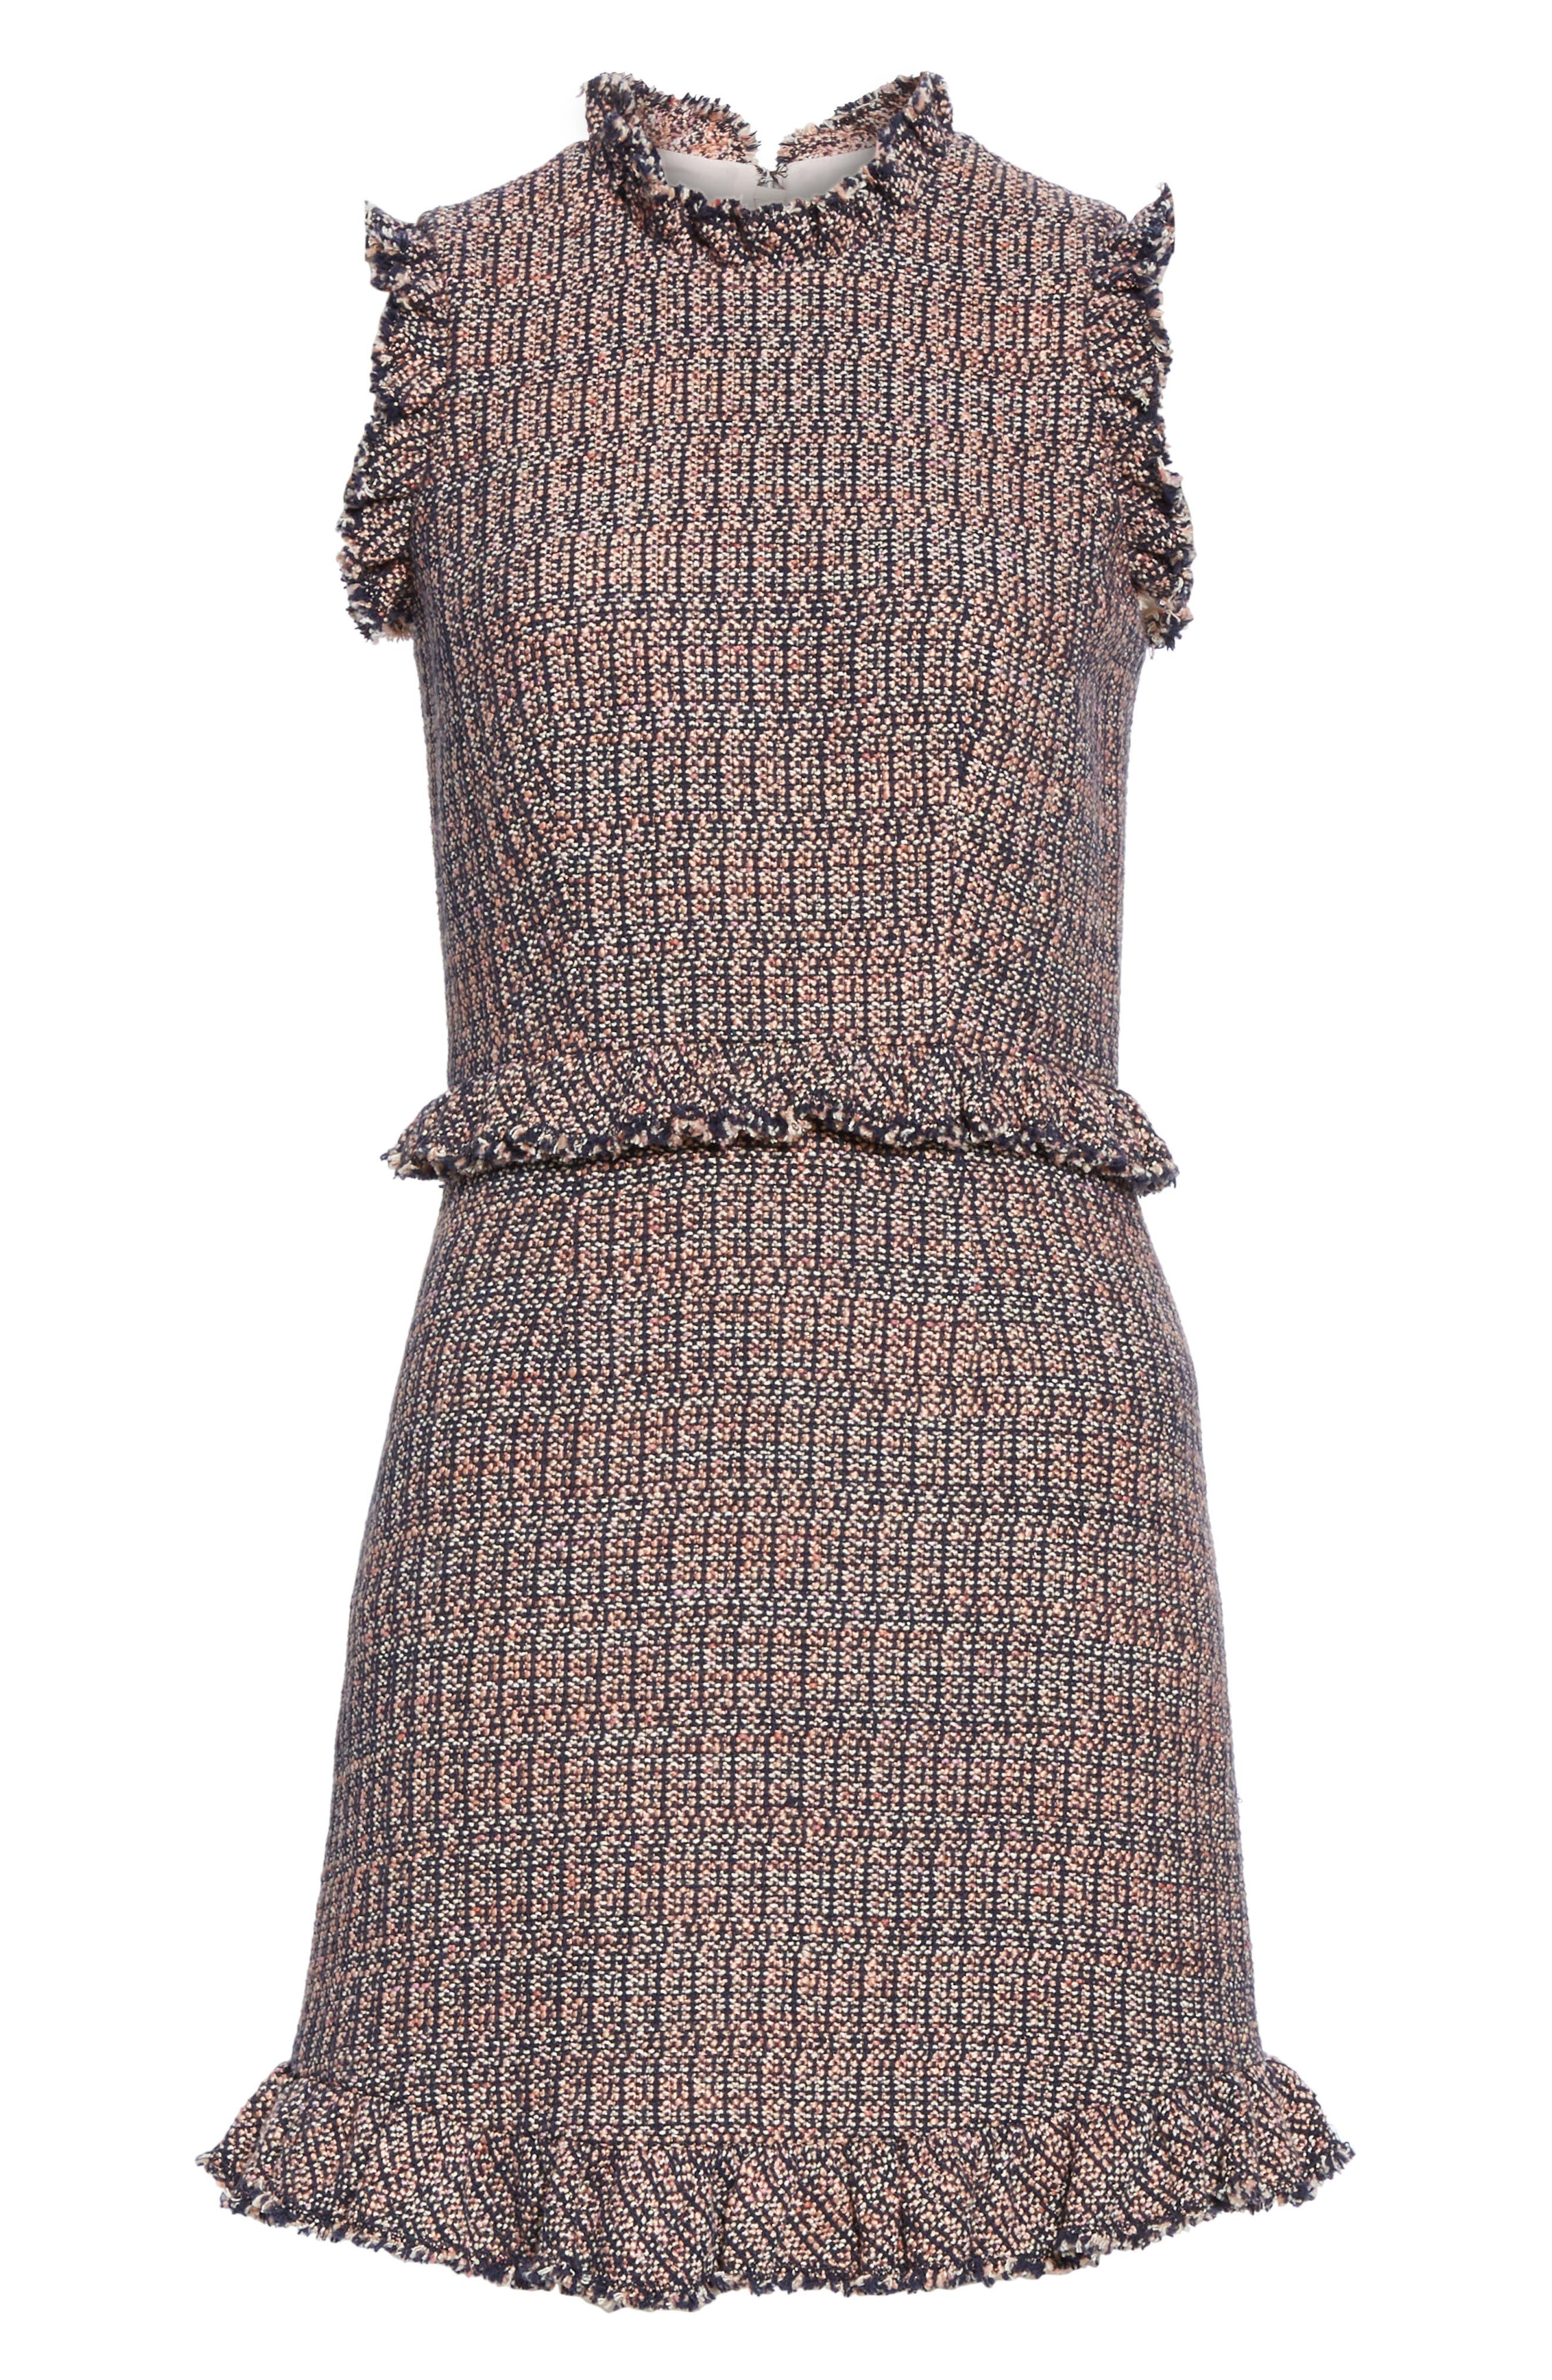 REBECCA TAYLOR, Frayed Ruffle Tweed Dress, Alternate thumbnail 7, color, PINK/ NAVY COMBO